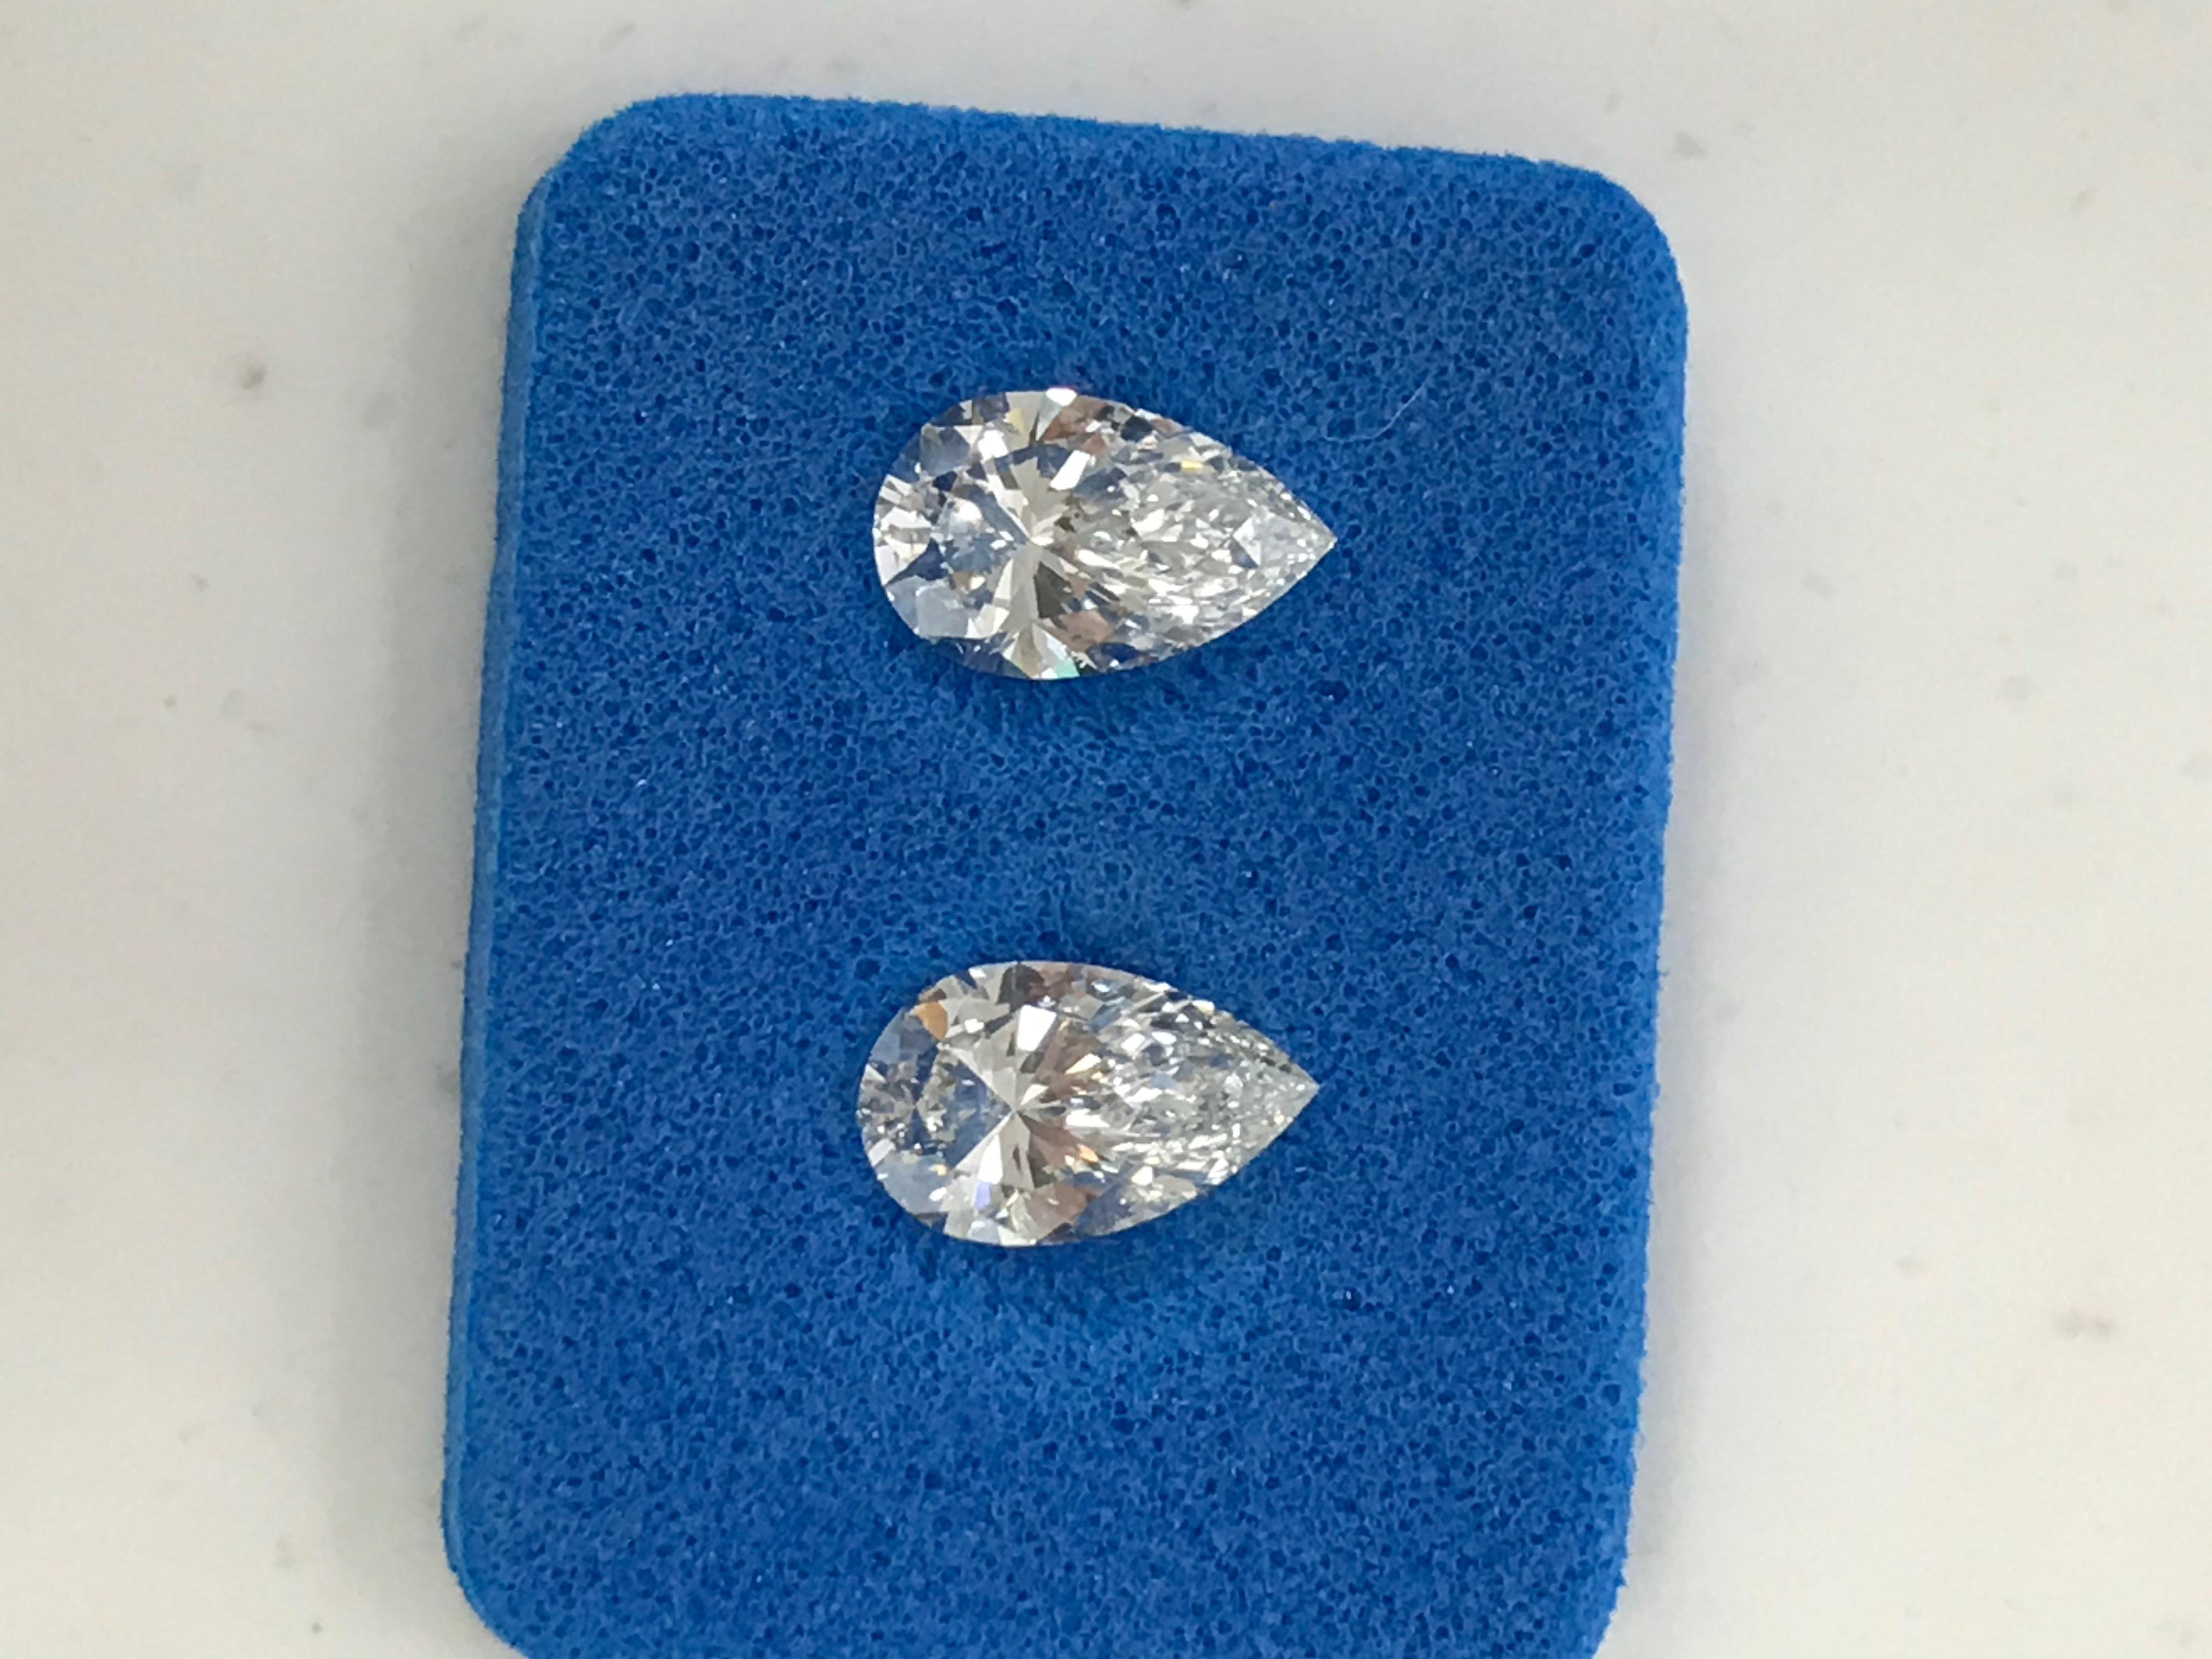 Sam Dial Jewelers - Diamond Image - .00900